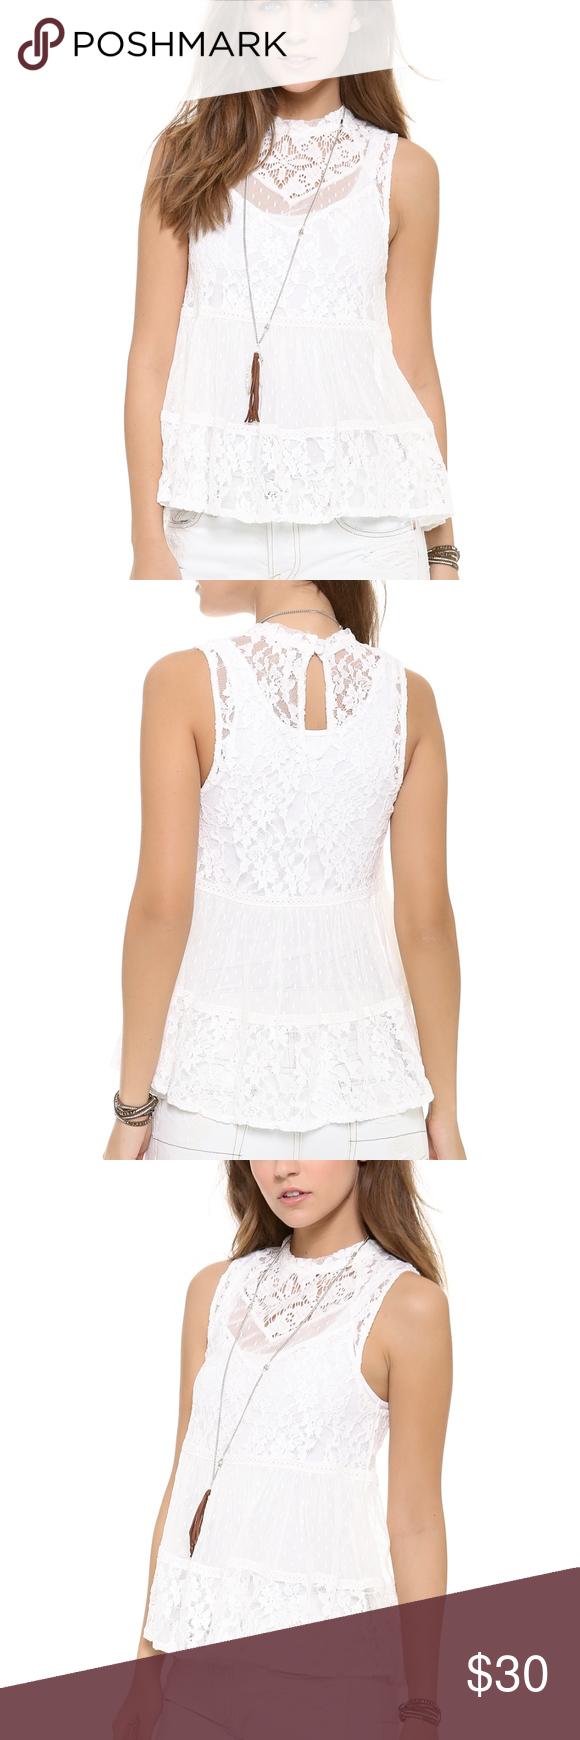 8864f56276fa0f Free People Lady Bird Lace Tank, Ivory Delicate, mixed-pattern lace high-